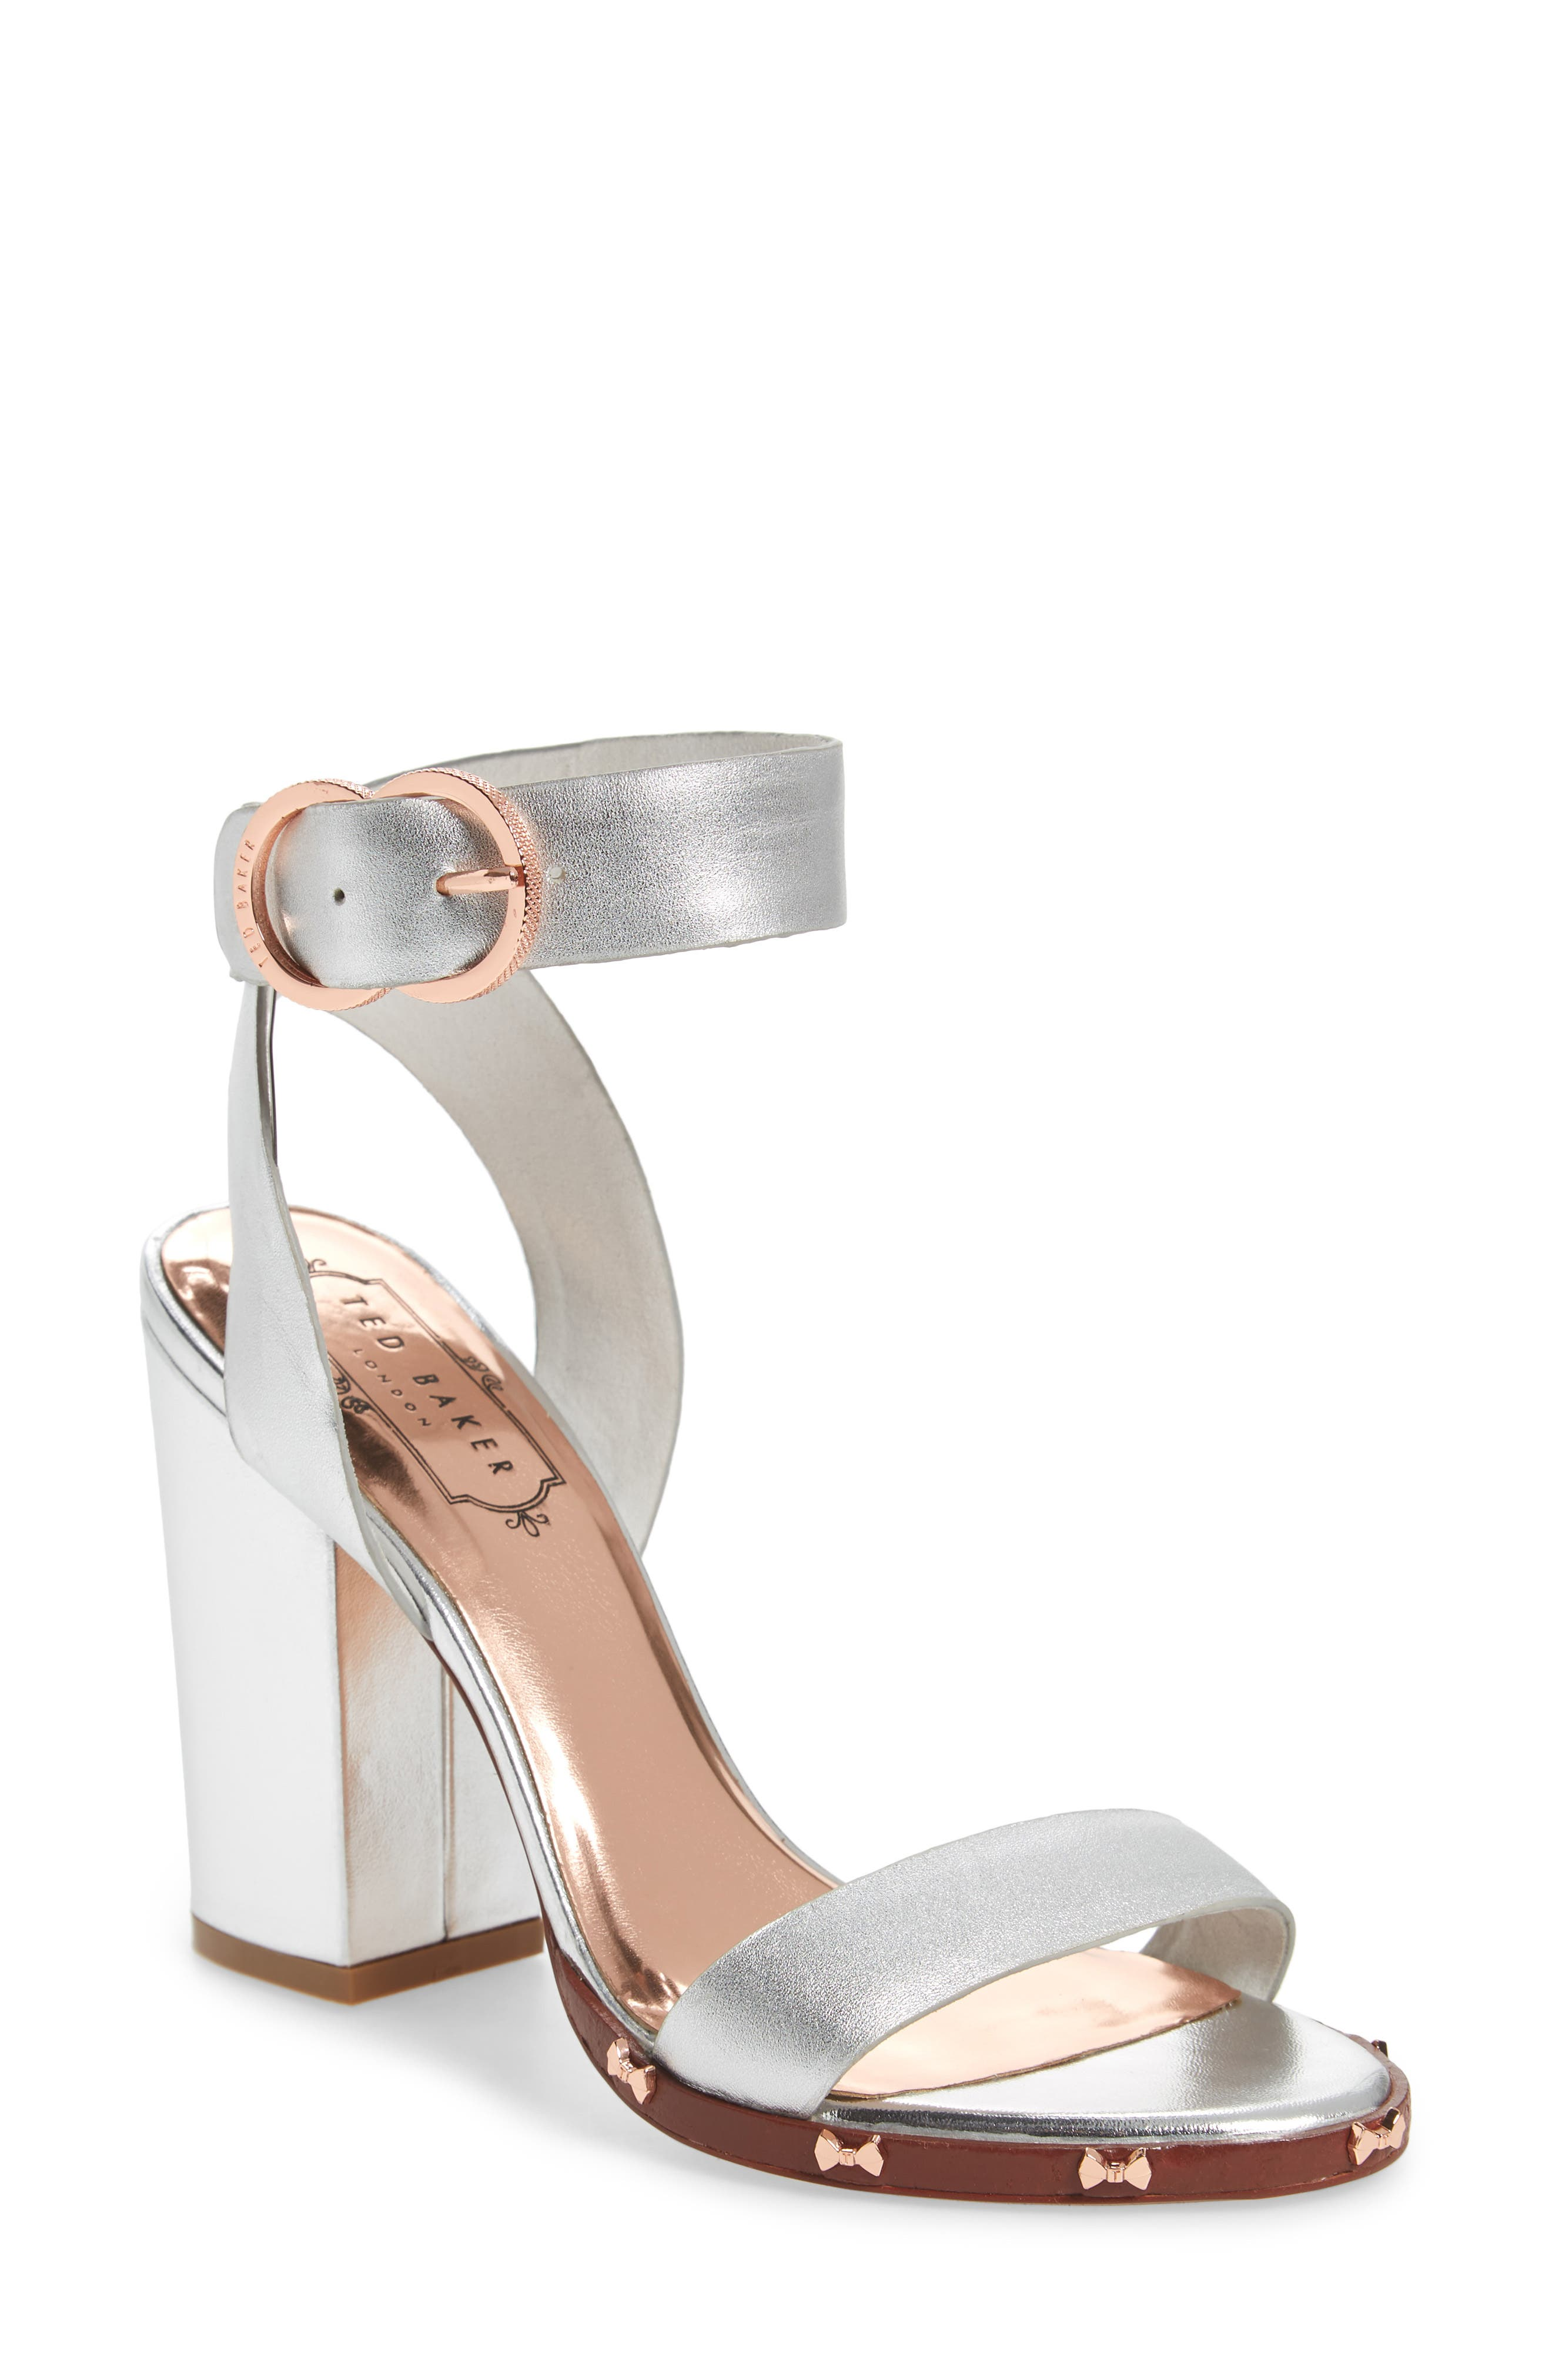 Lylea Block Heel Sandal,                             Main thumbnail 1, color,                             Silver Leather